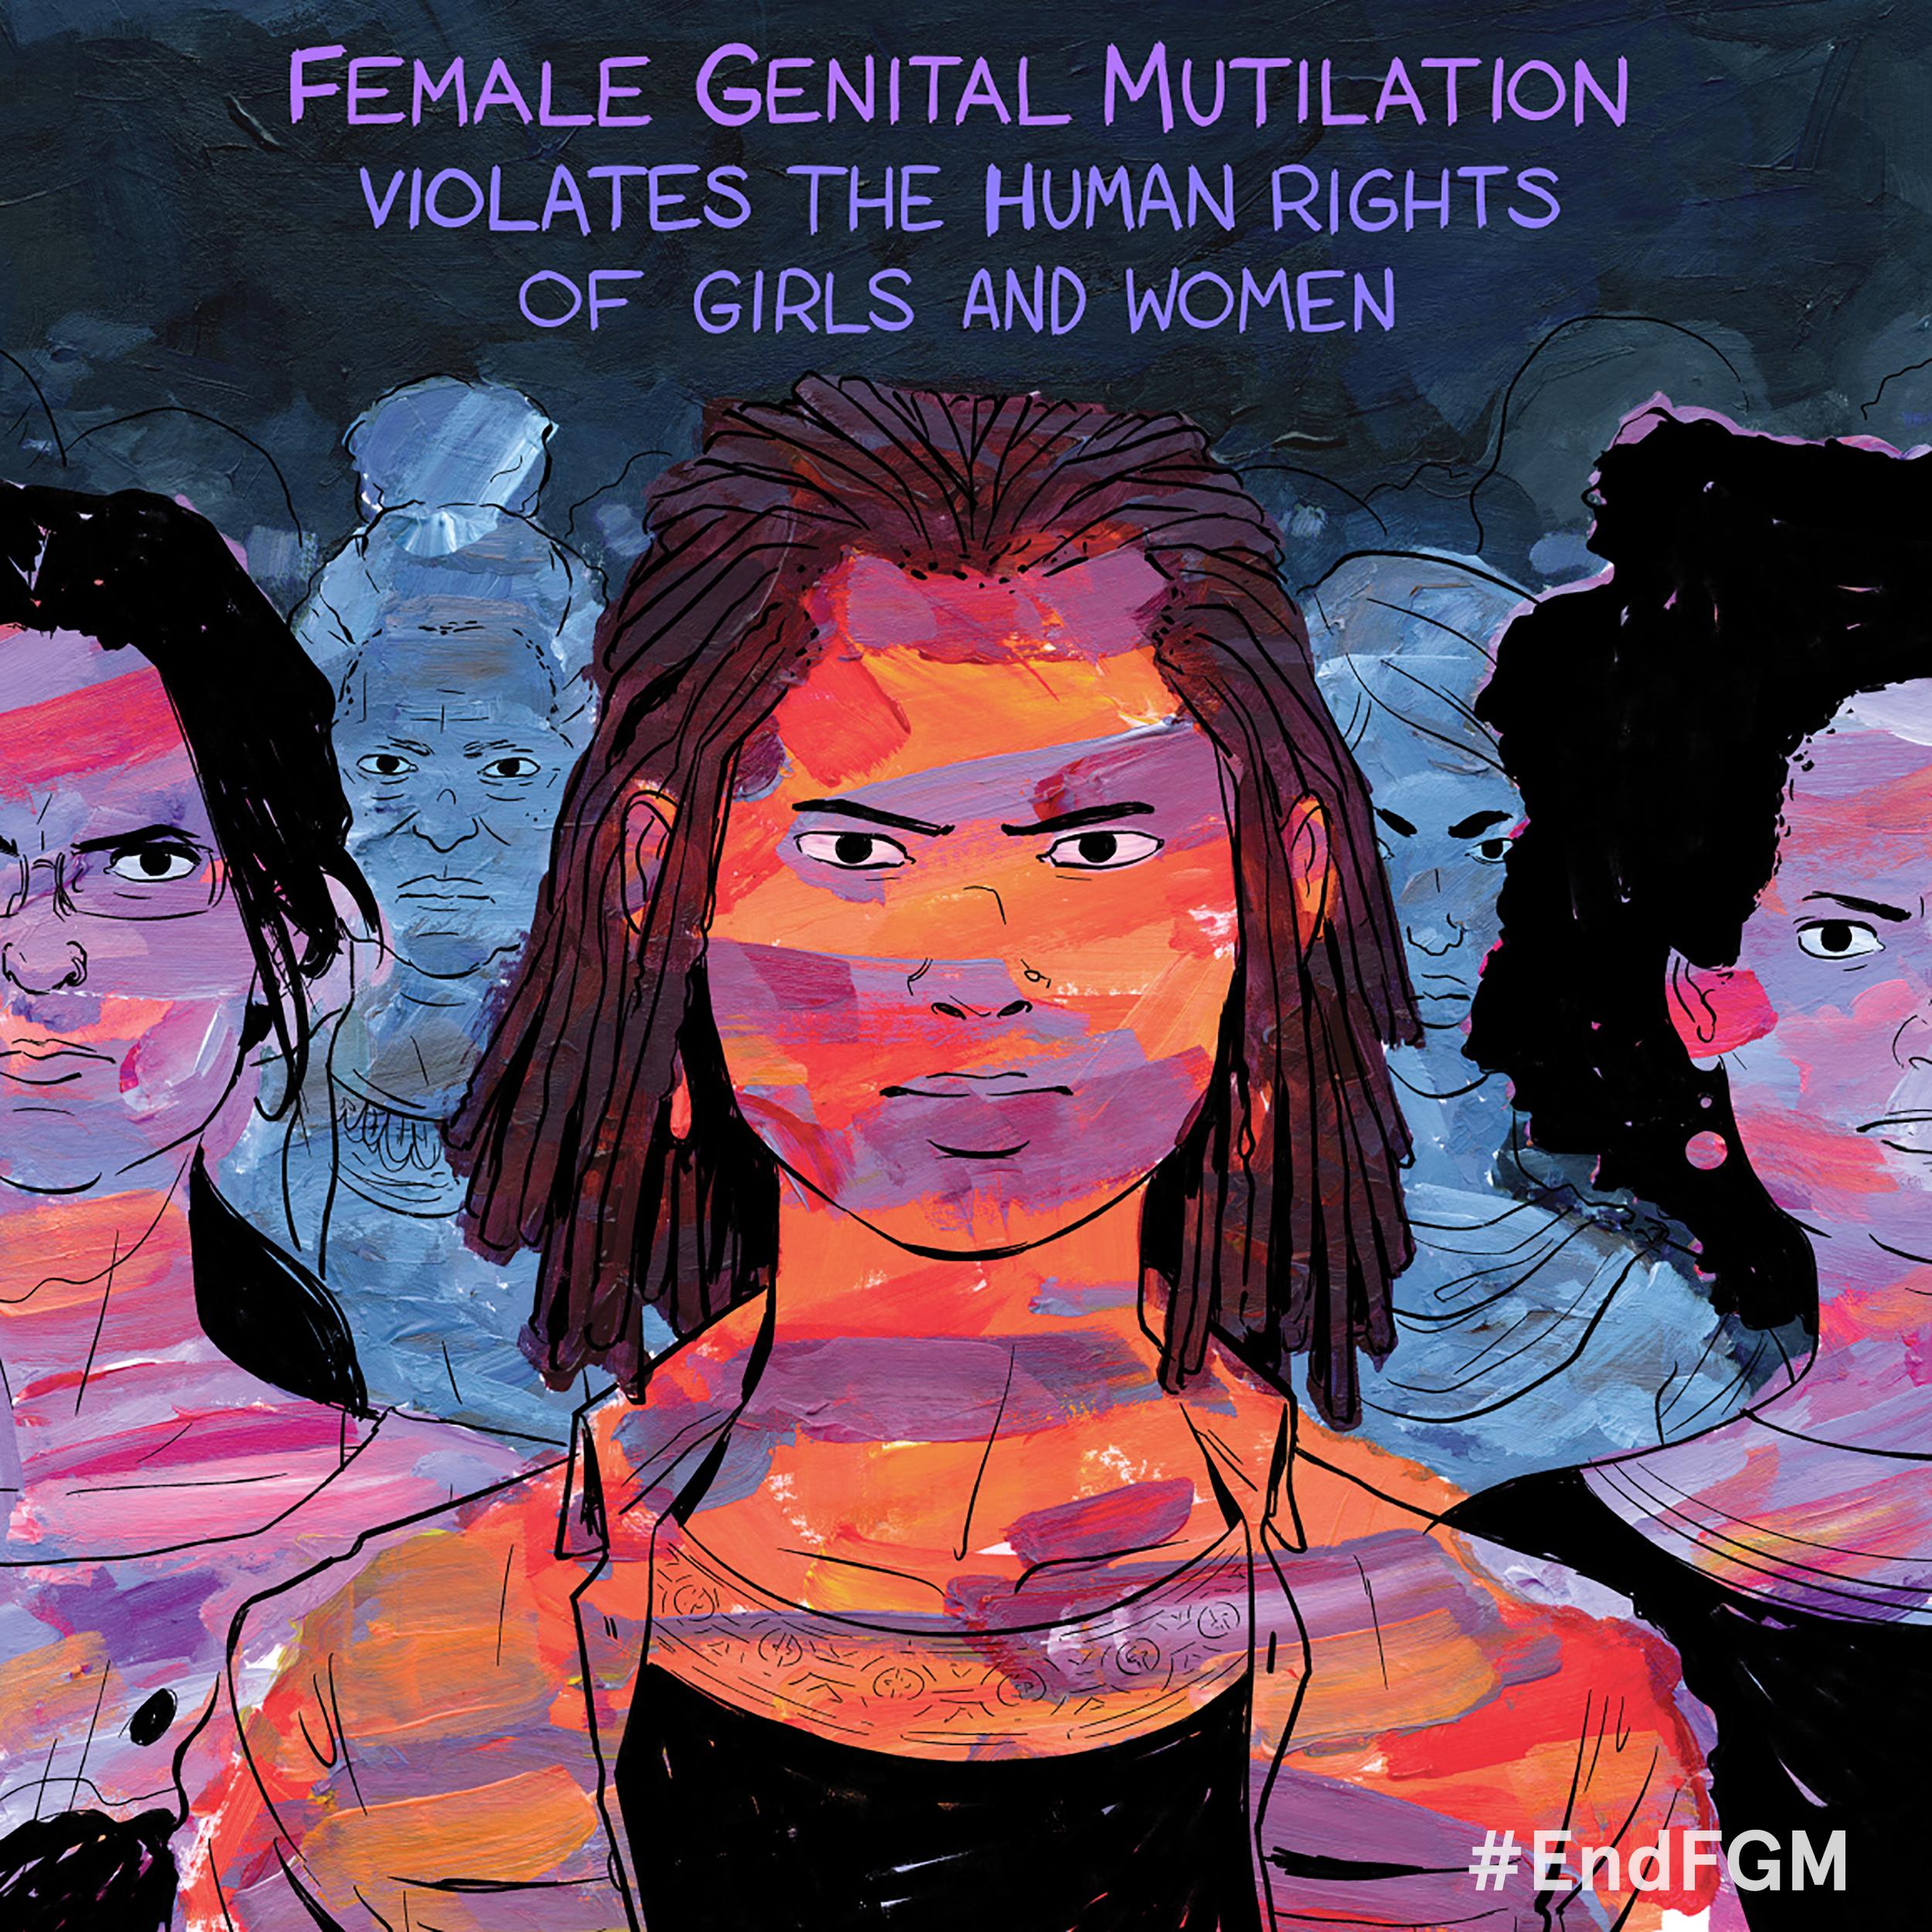 FGM Image8 Watermark.png